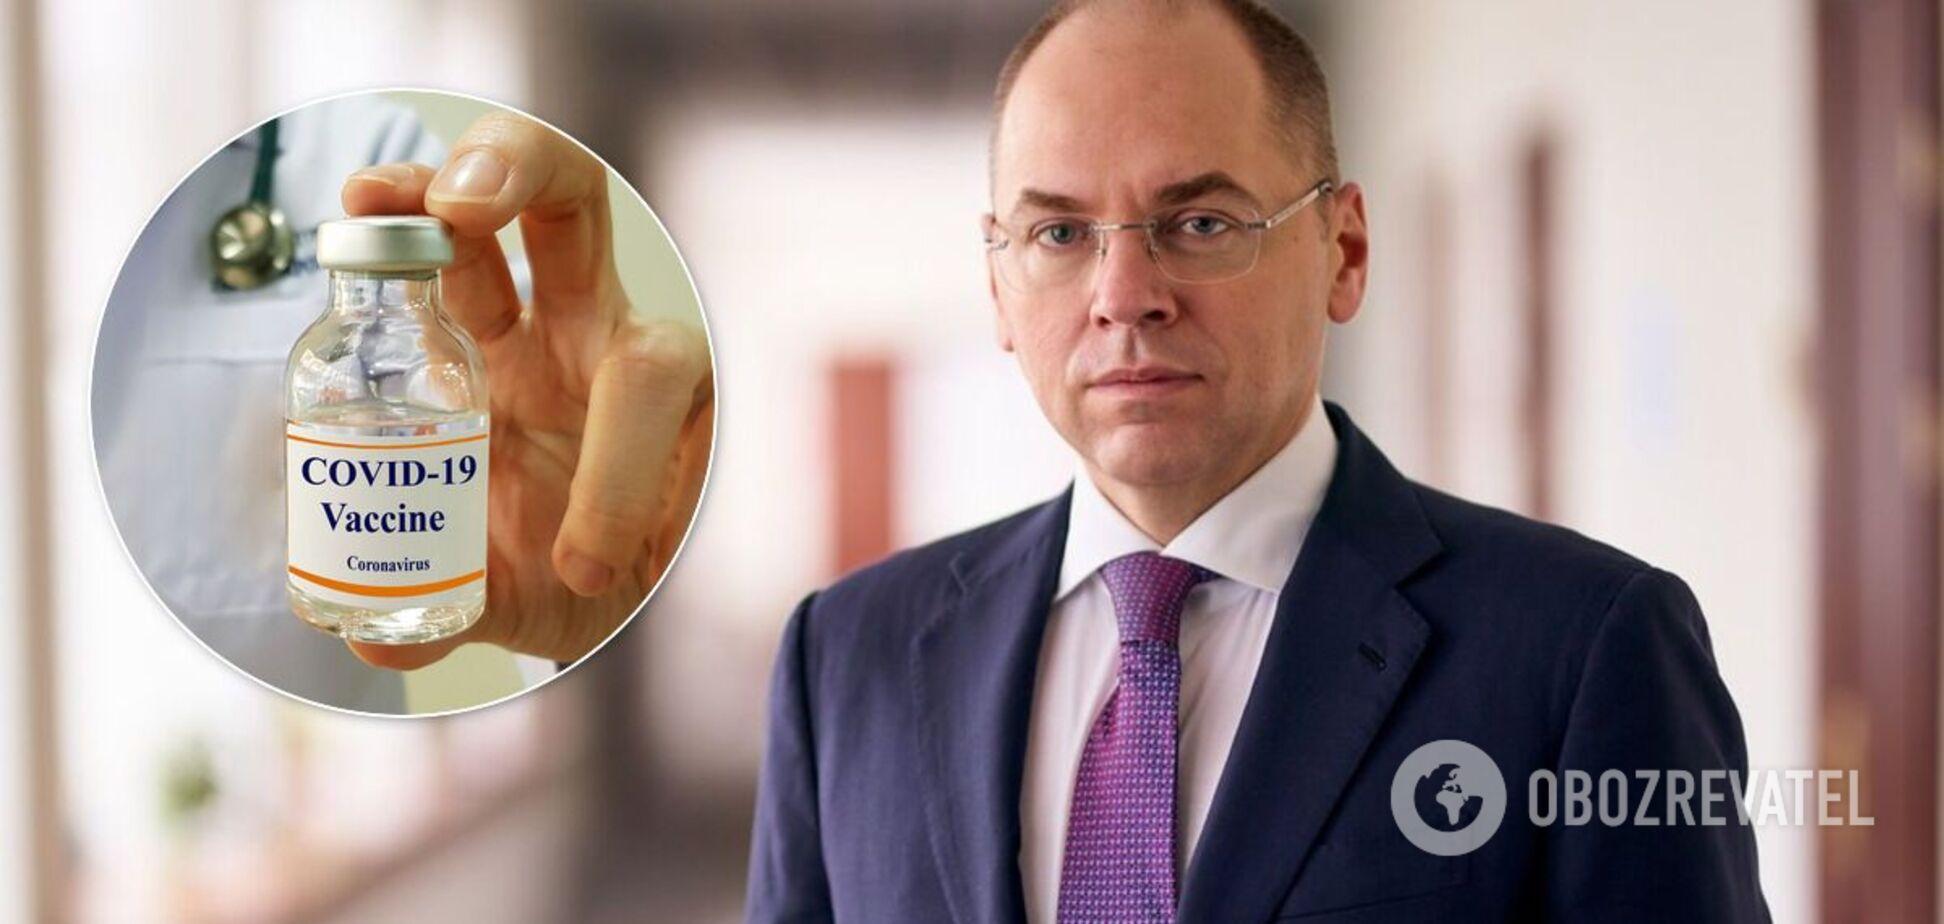 Степанов сказав, коли вакцина проти COVID-19 повинна надійти в Україну